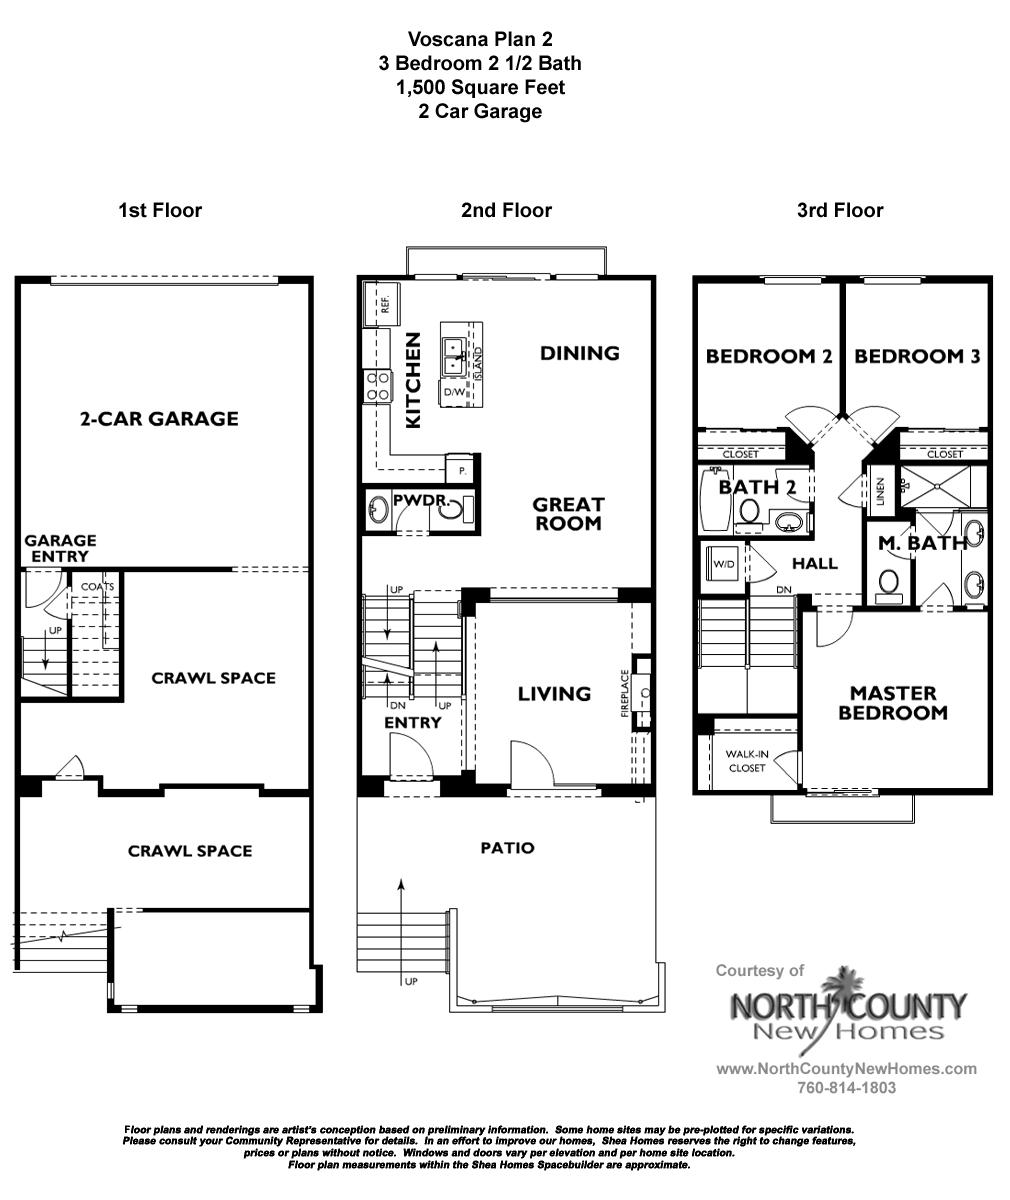 Voscana floor plan 2 new townhomes in carlsbad ca by shea homes new home floor plans in for Shea homes design center san diego